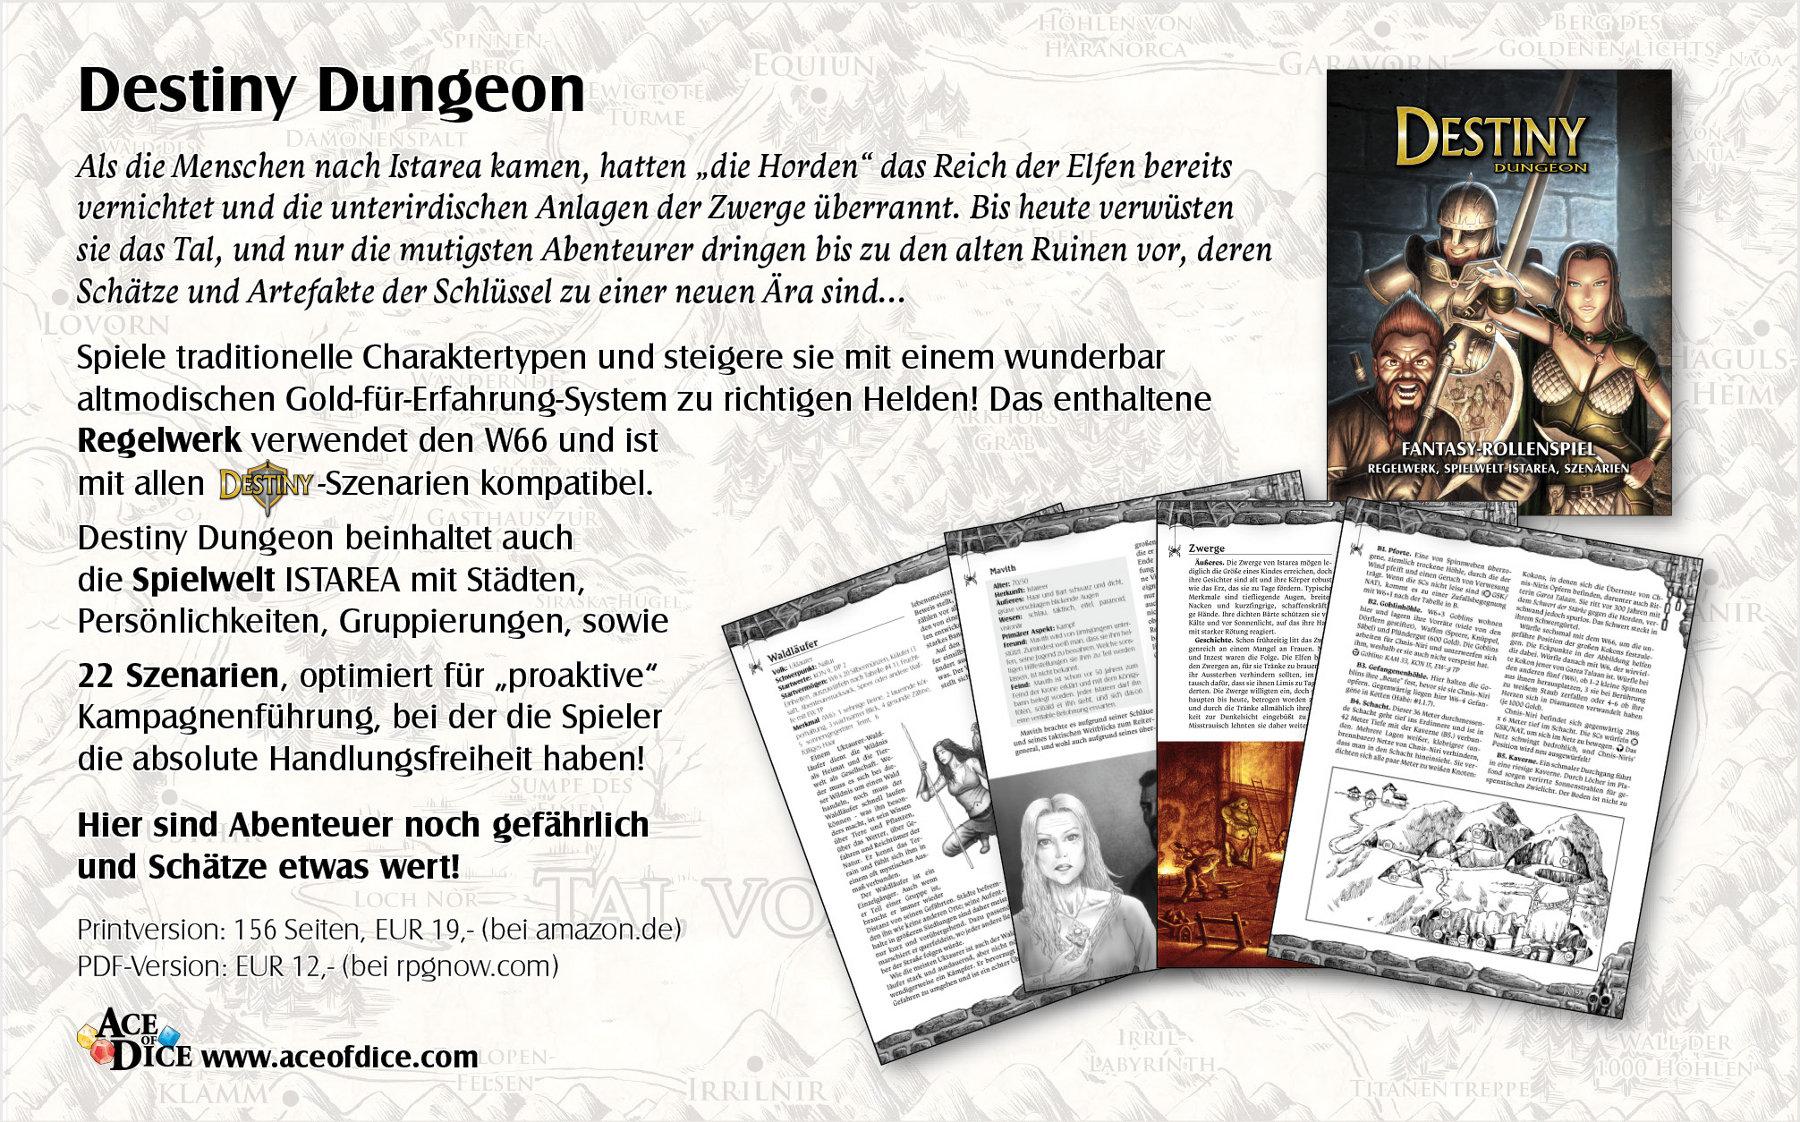 Destiny Dungeon ad